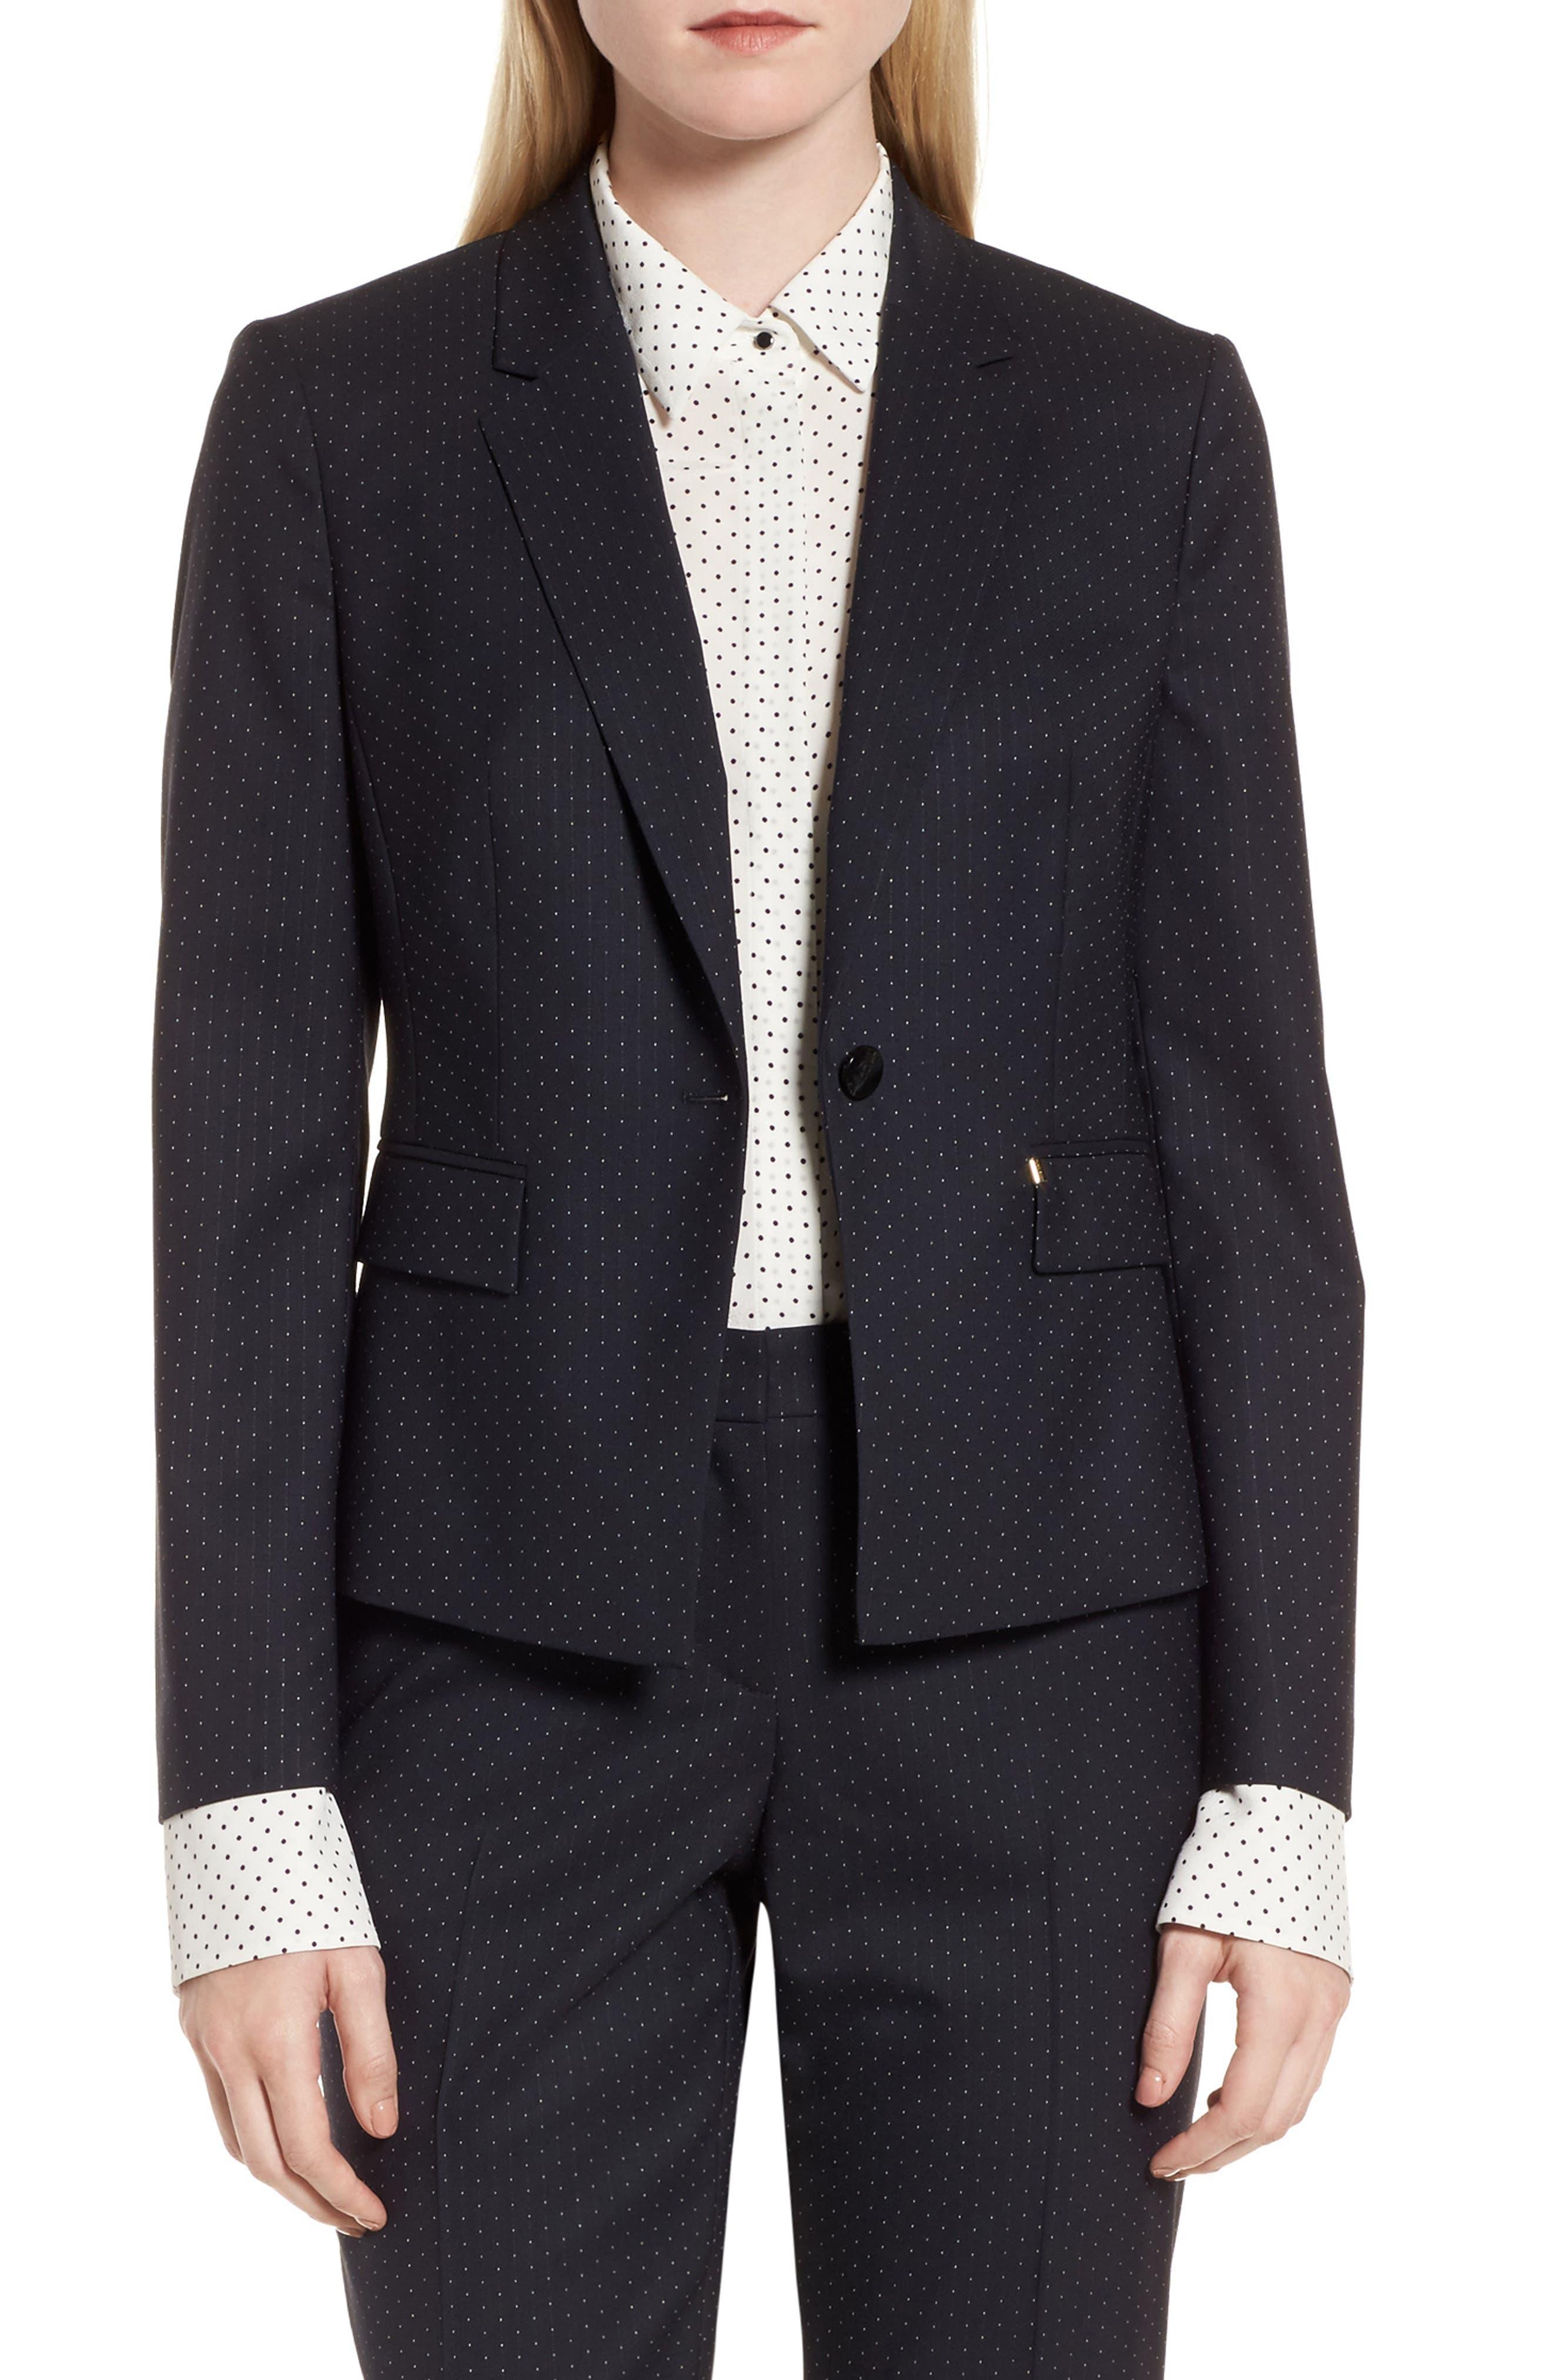 Jinalika Wool Suit Jacket,                         Main,                         color,